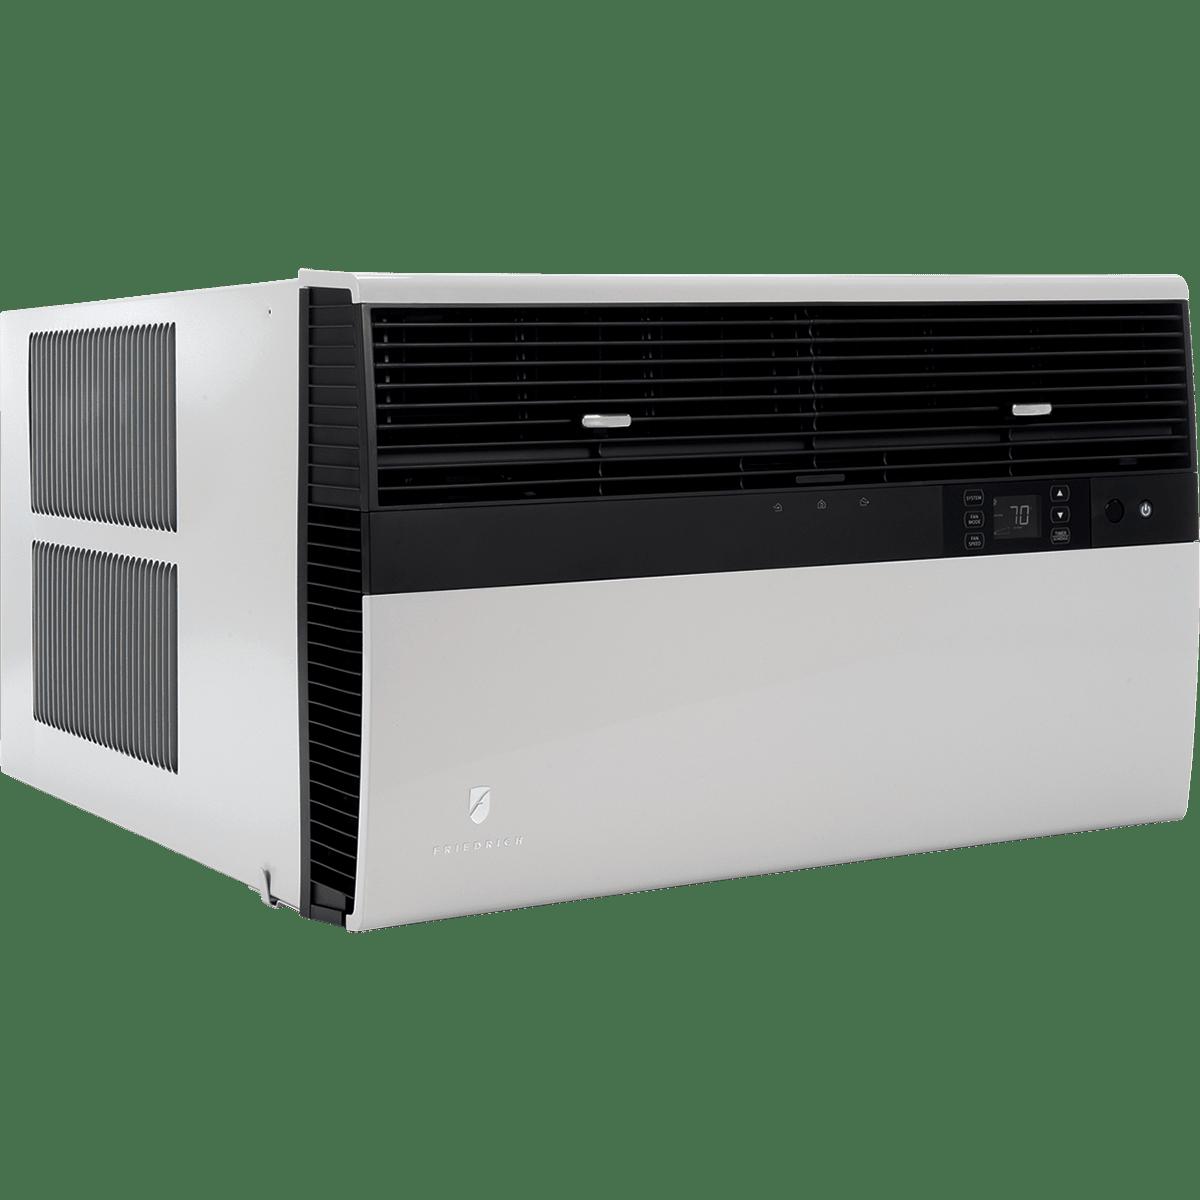 Friedrich Wall Air Conditioner Wiring Diagram Simple Electronic Diagrams Kuhl 12 000 Btu Window Ac Heater Sylvane Rh Com Thermostat